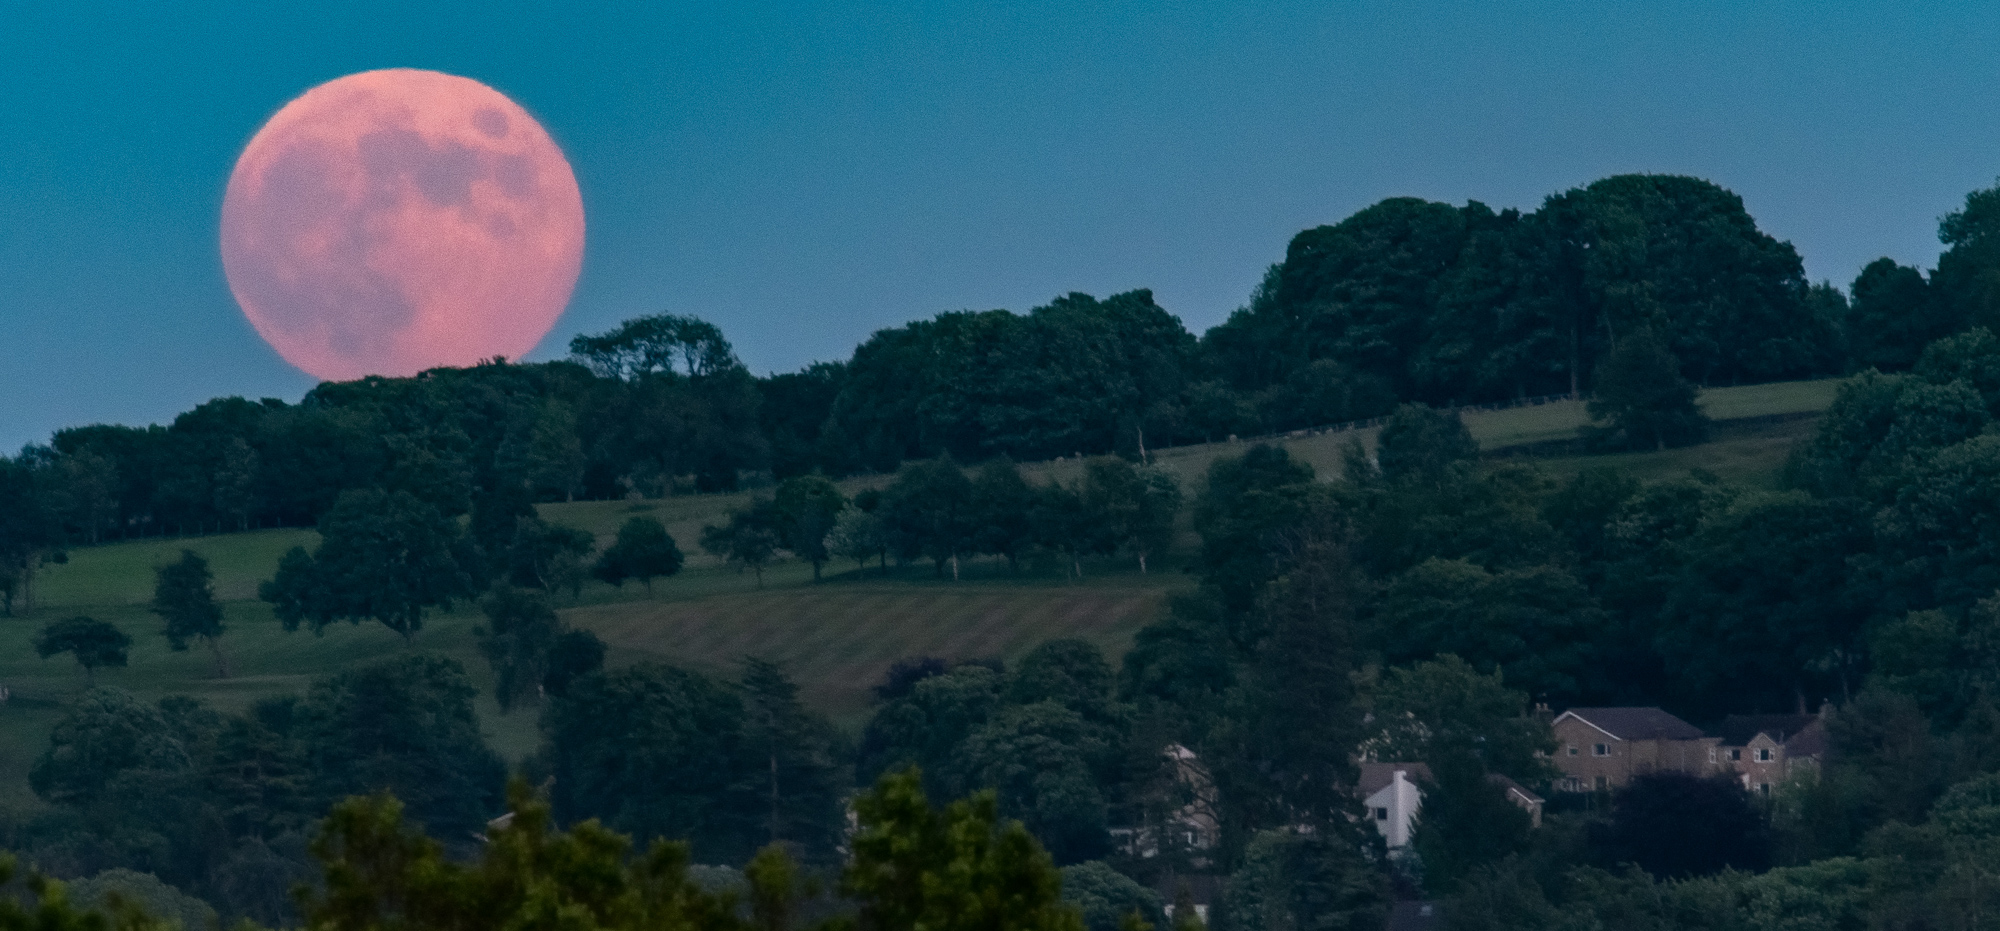 2000x931-Ilkley-Full-Moon-June-2020